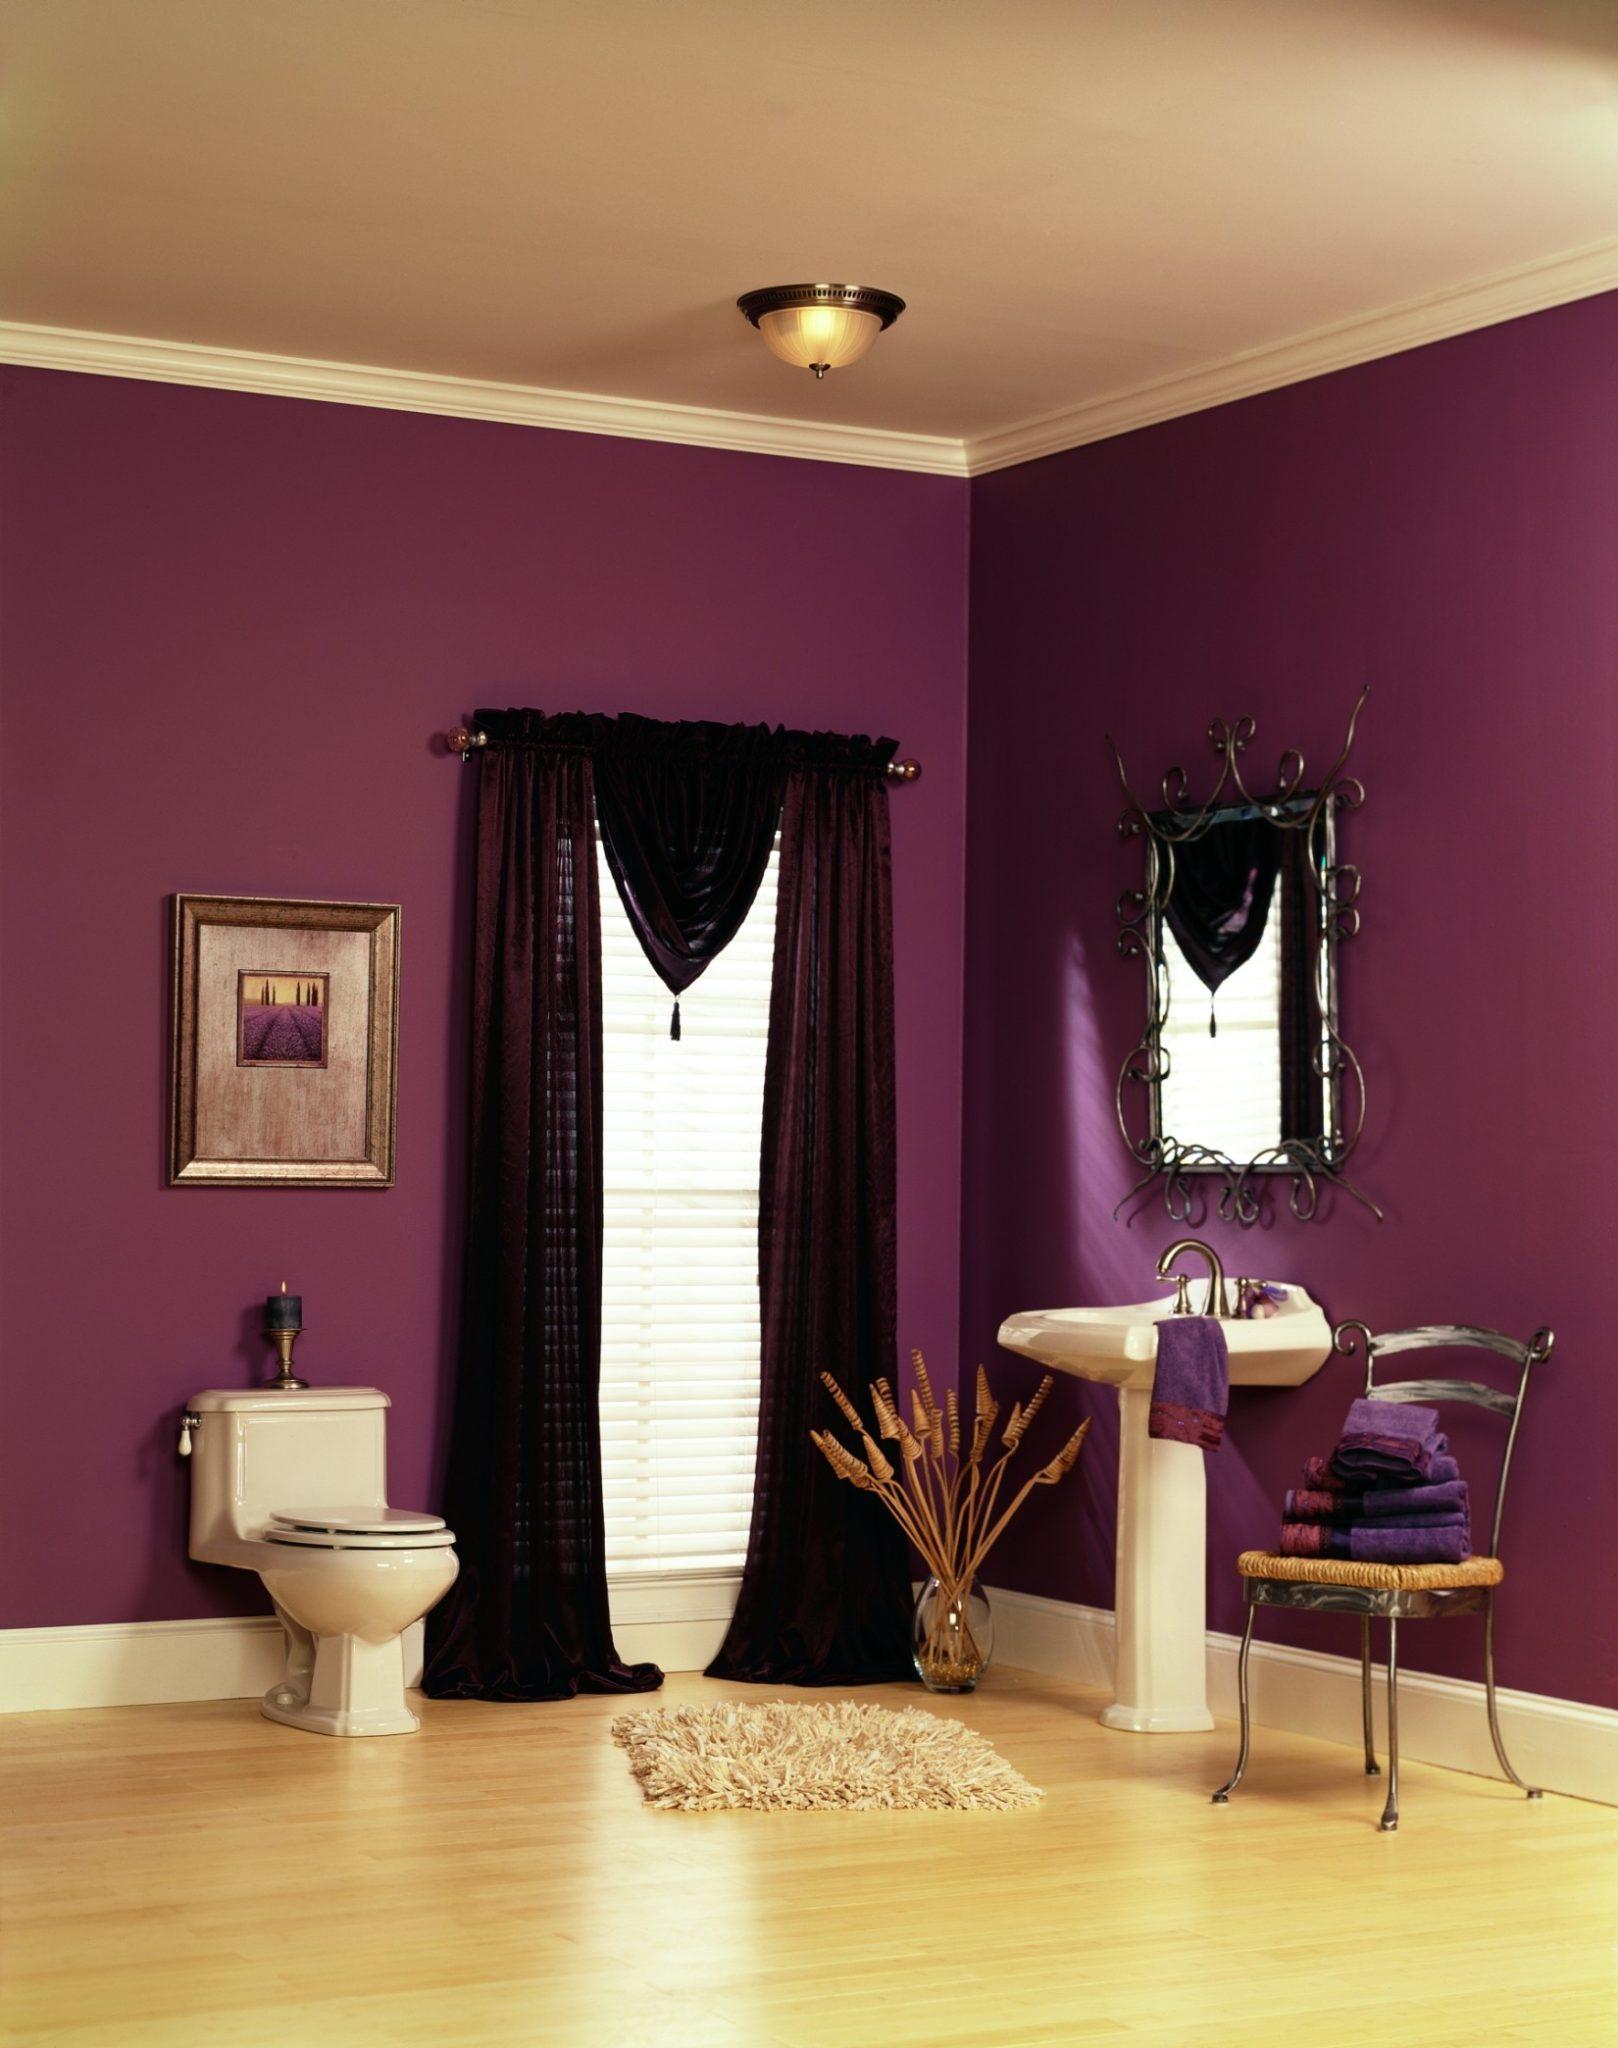 bathroom remodel, bathroom paint ideas, bathroom facelift